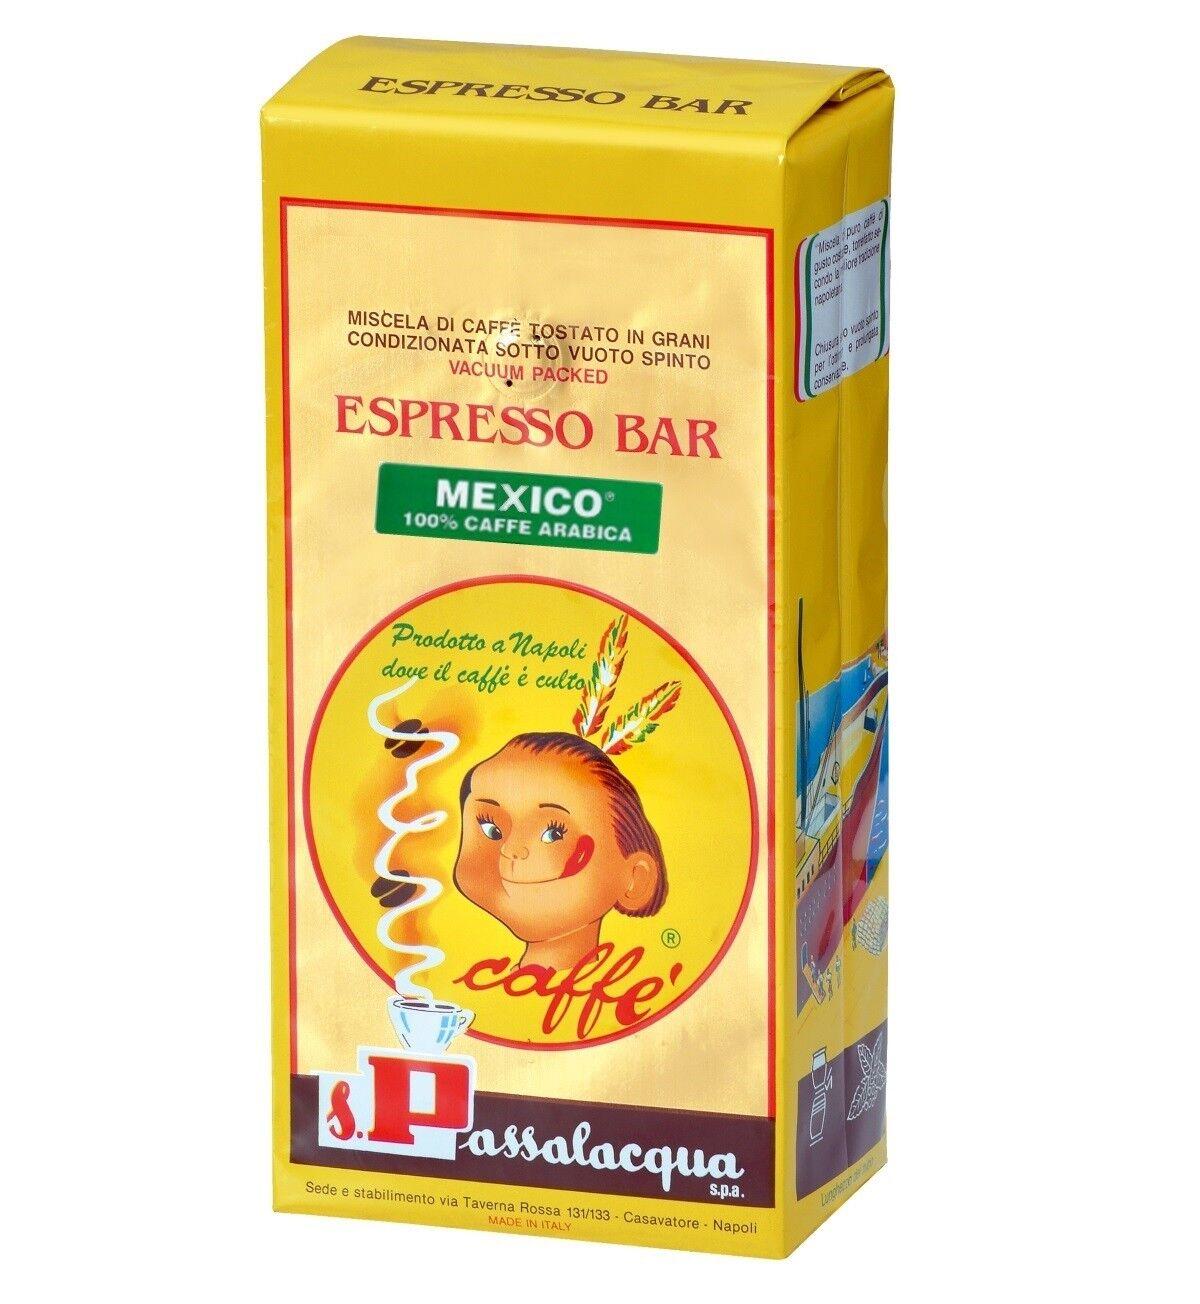 PASSALACQUA Mexico 6 X 1 KG Bohnen im Beutel